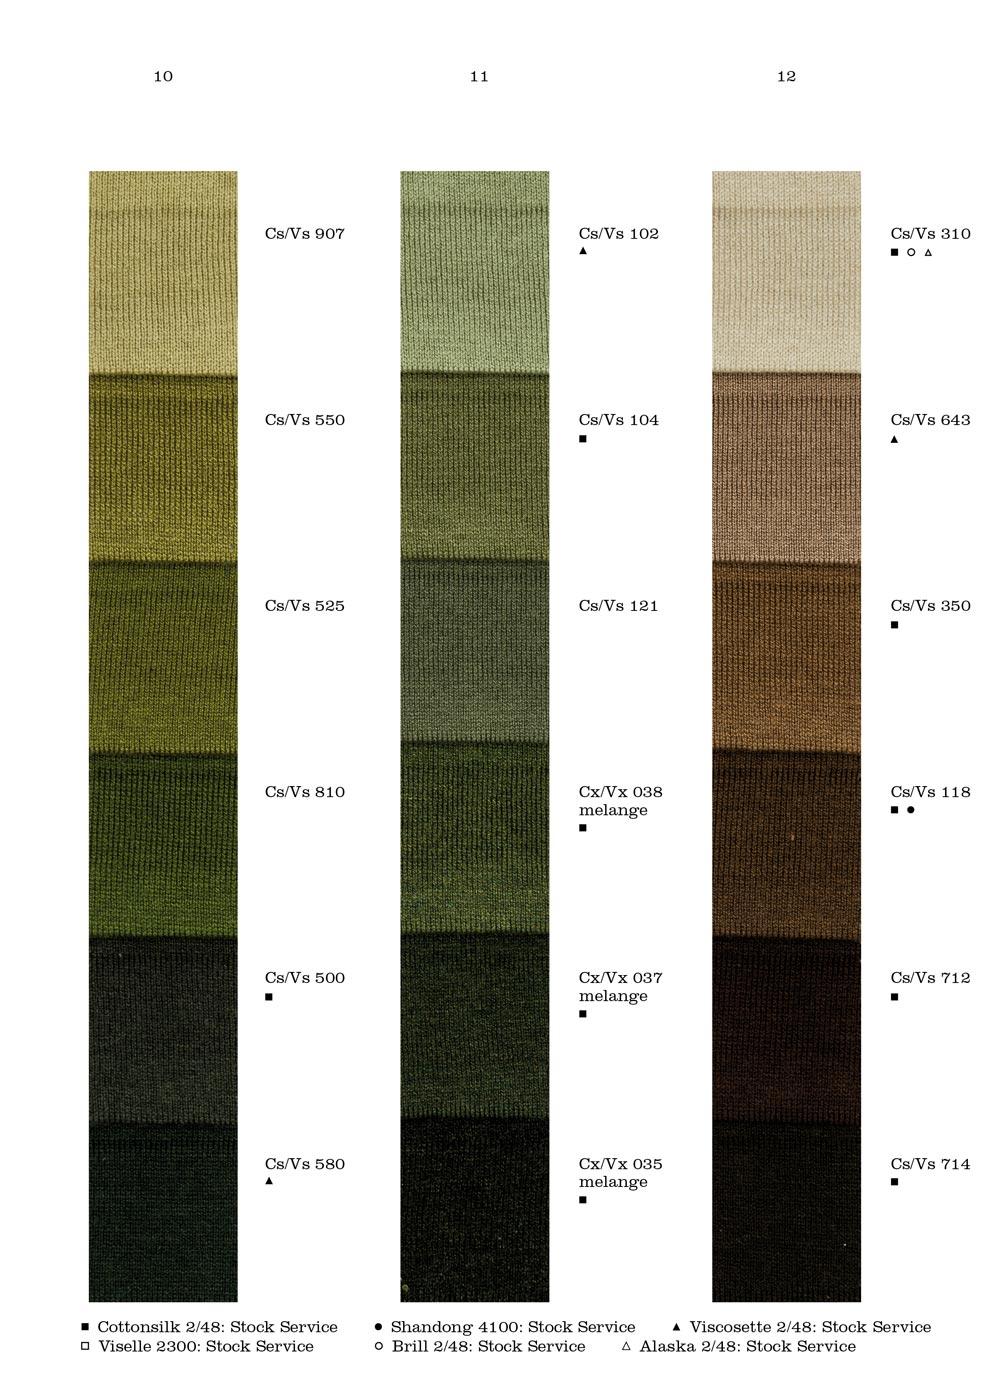 SeS_PE-22_Cottonsilk-Shandong-Viscosette-Viselle11